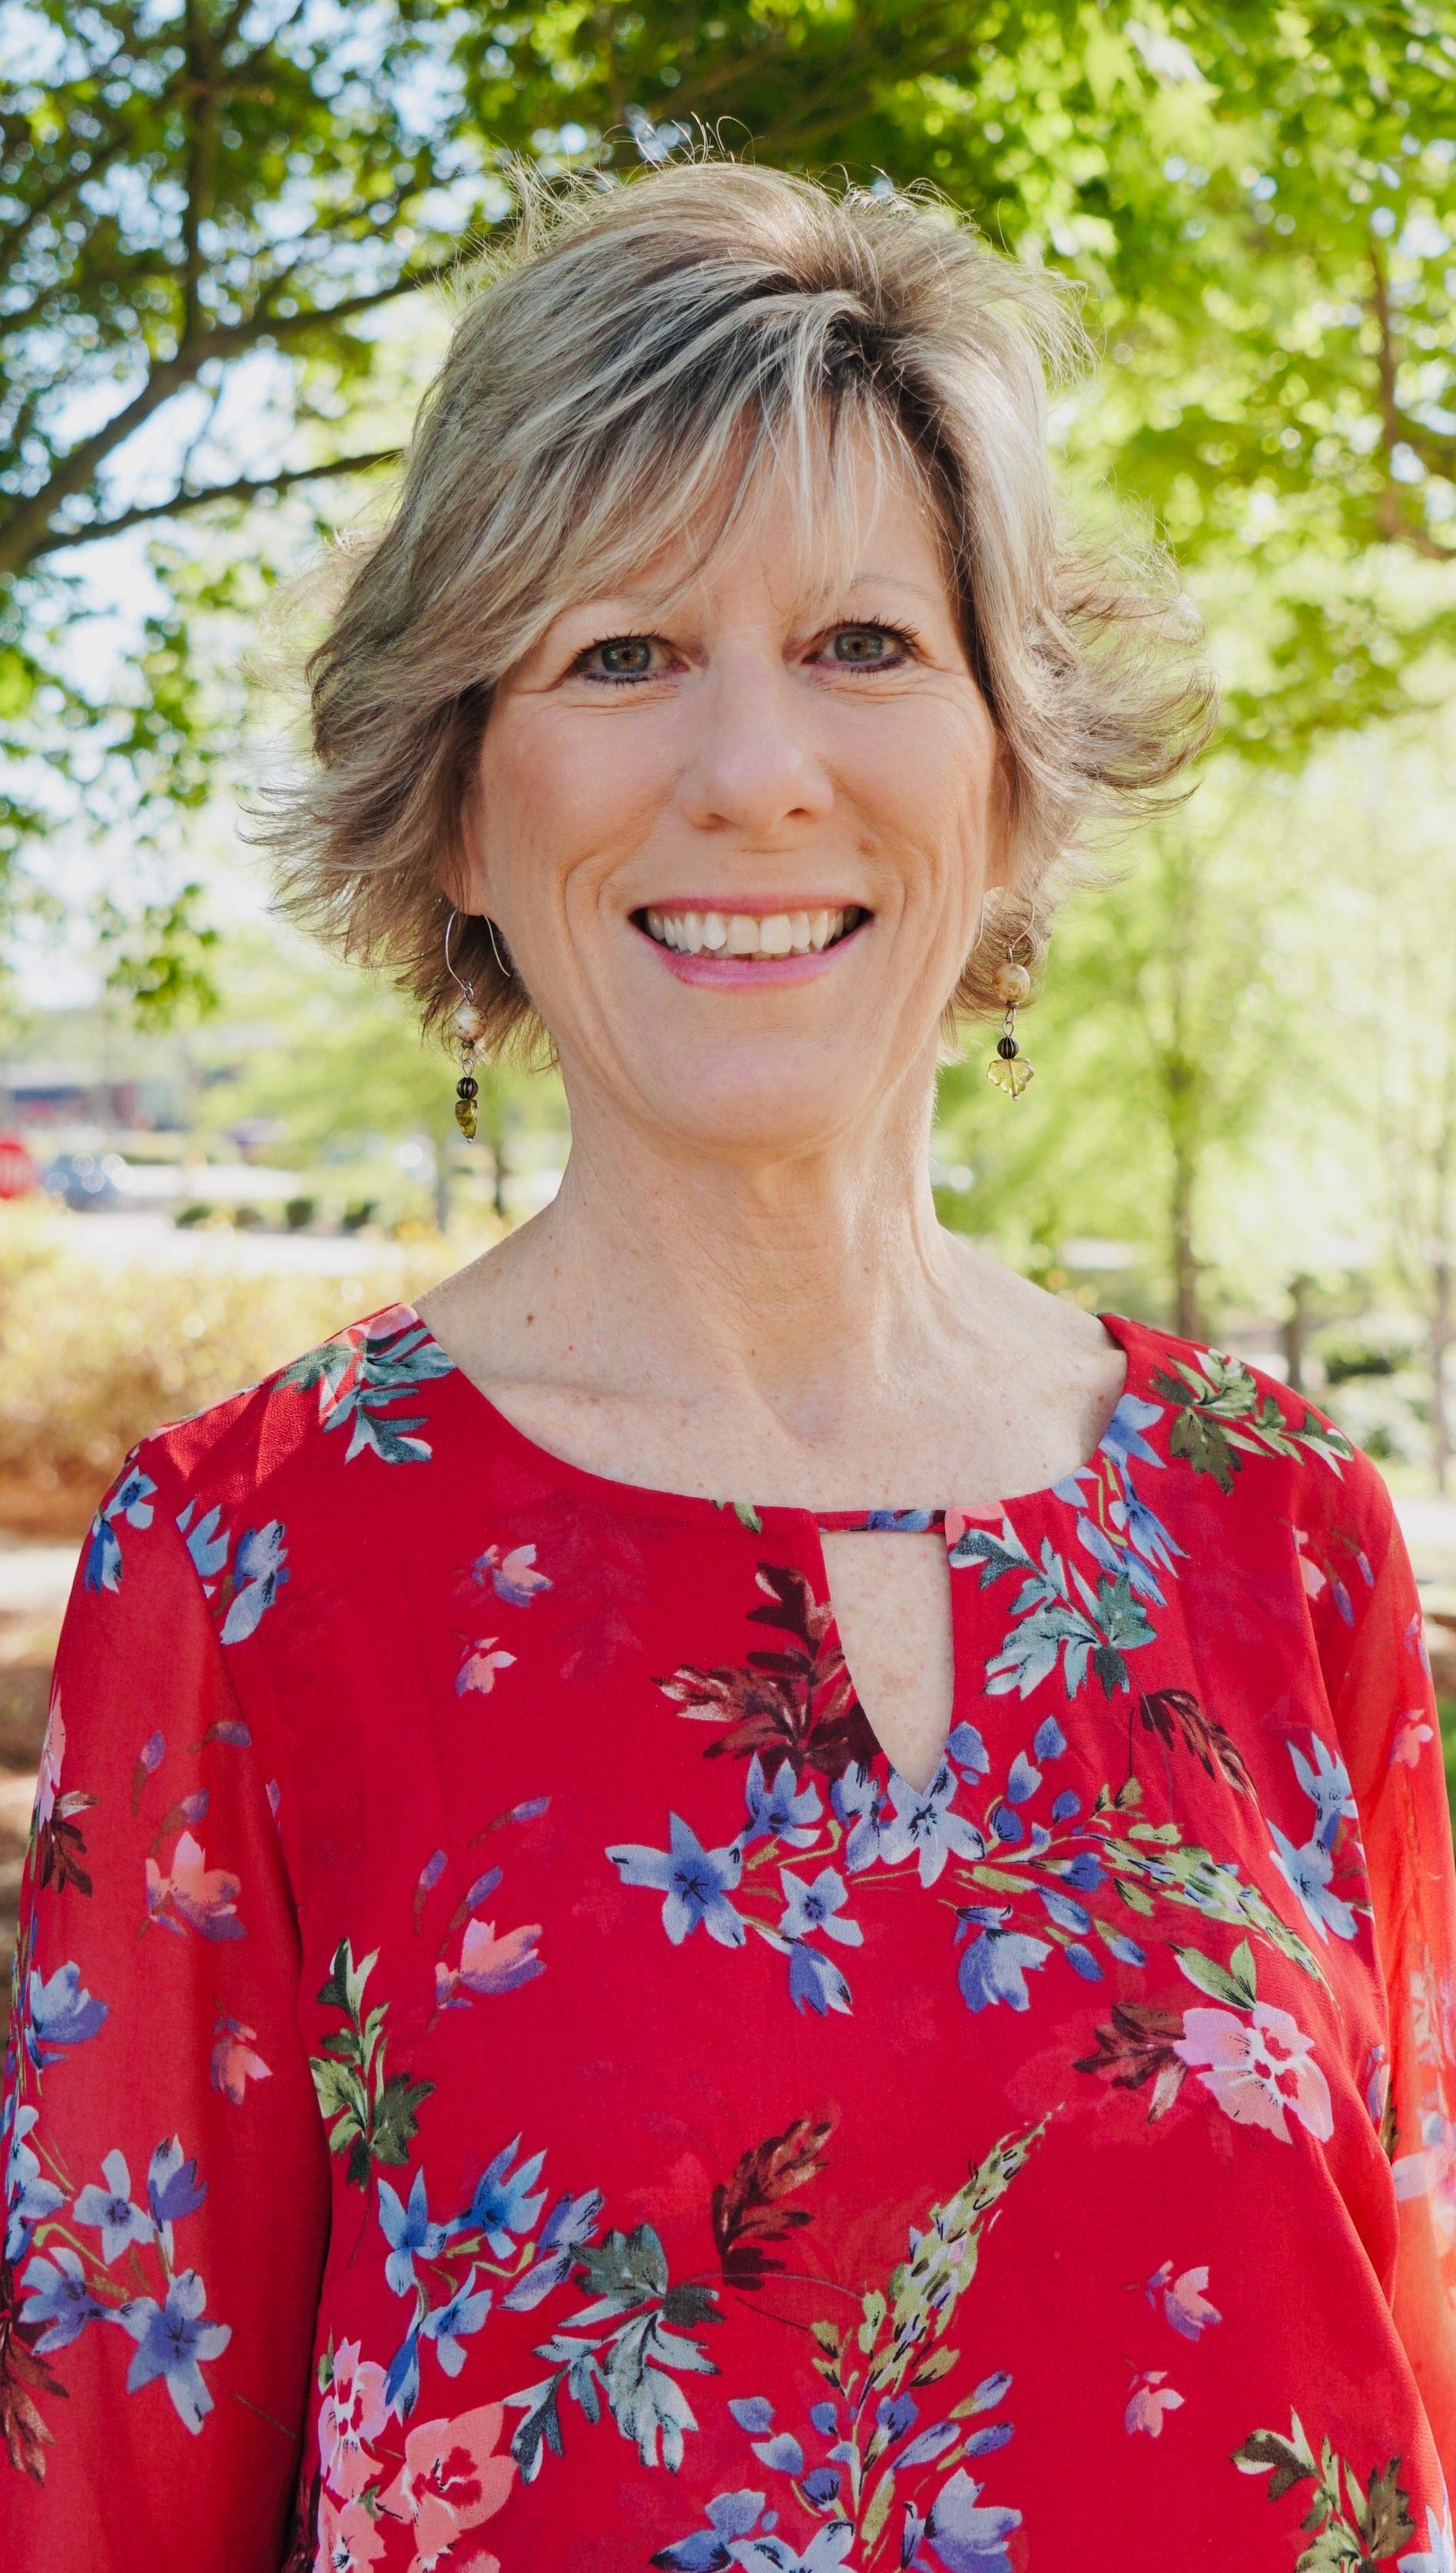 Judy Ice | Treasurer, Board Member   - Wife, Friend - Adventurer  - Facilitator